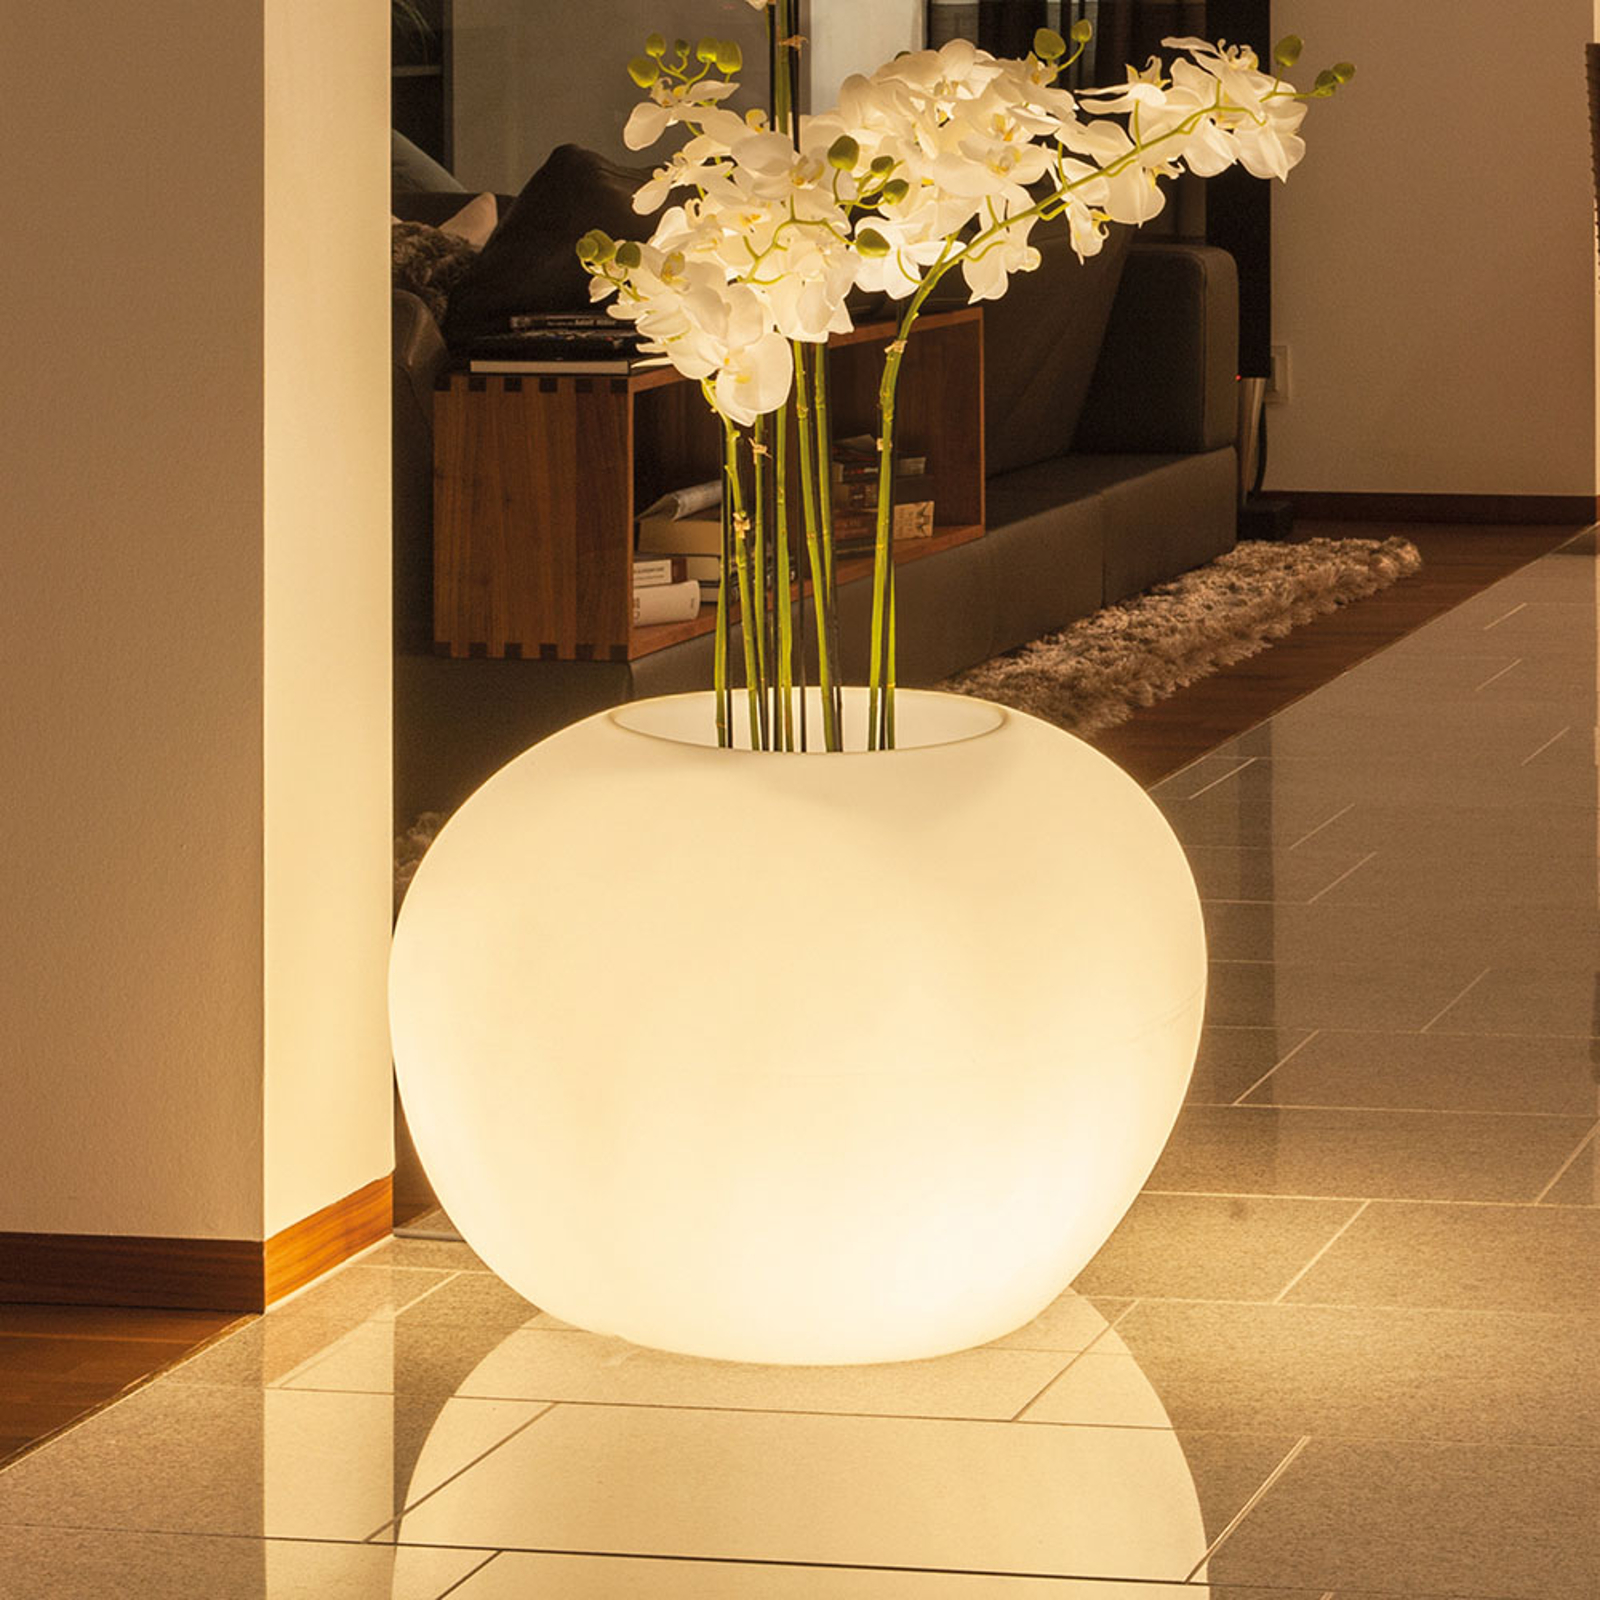 Storus IV dekolampe LED RGB+CCT, beplantes, hvid